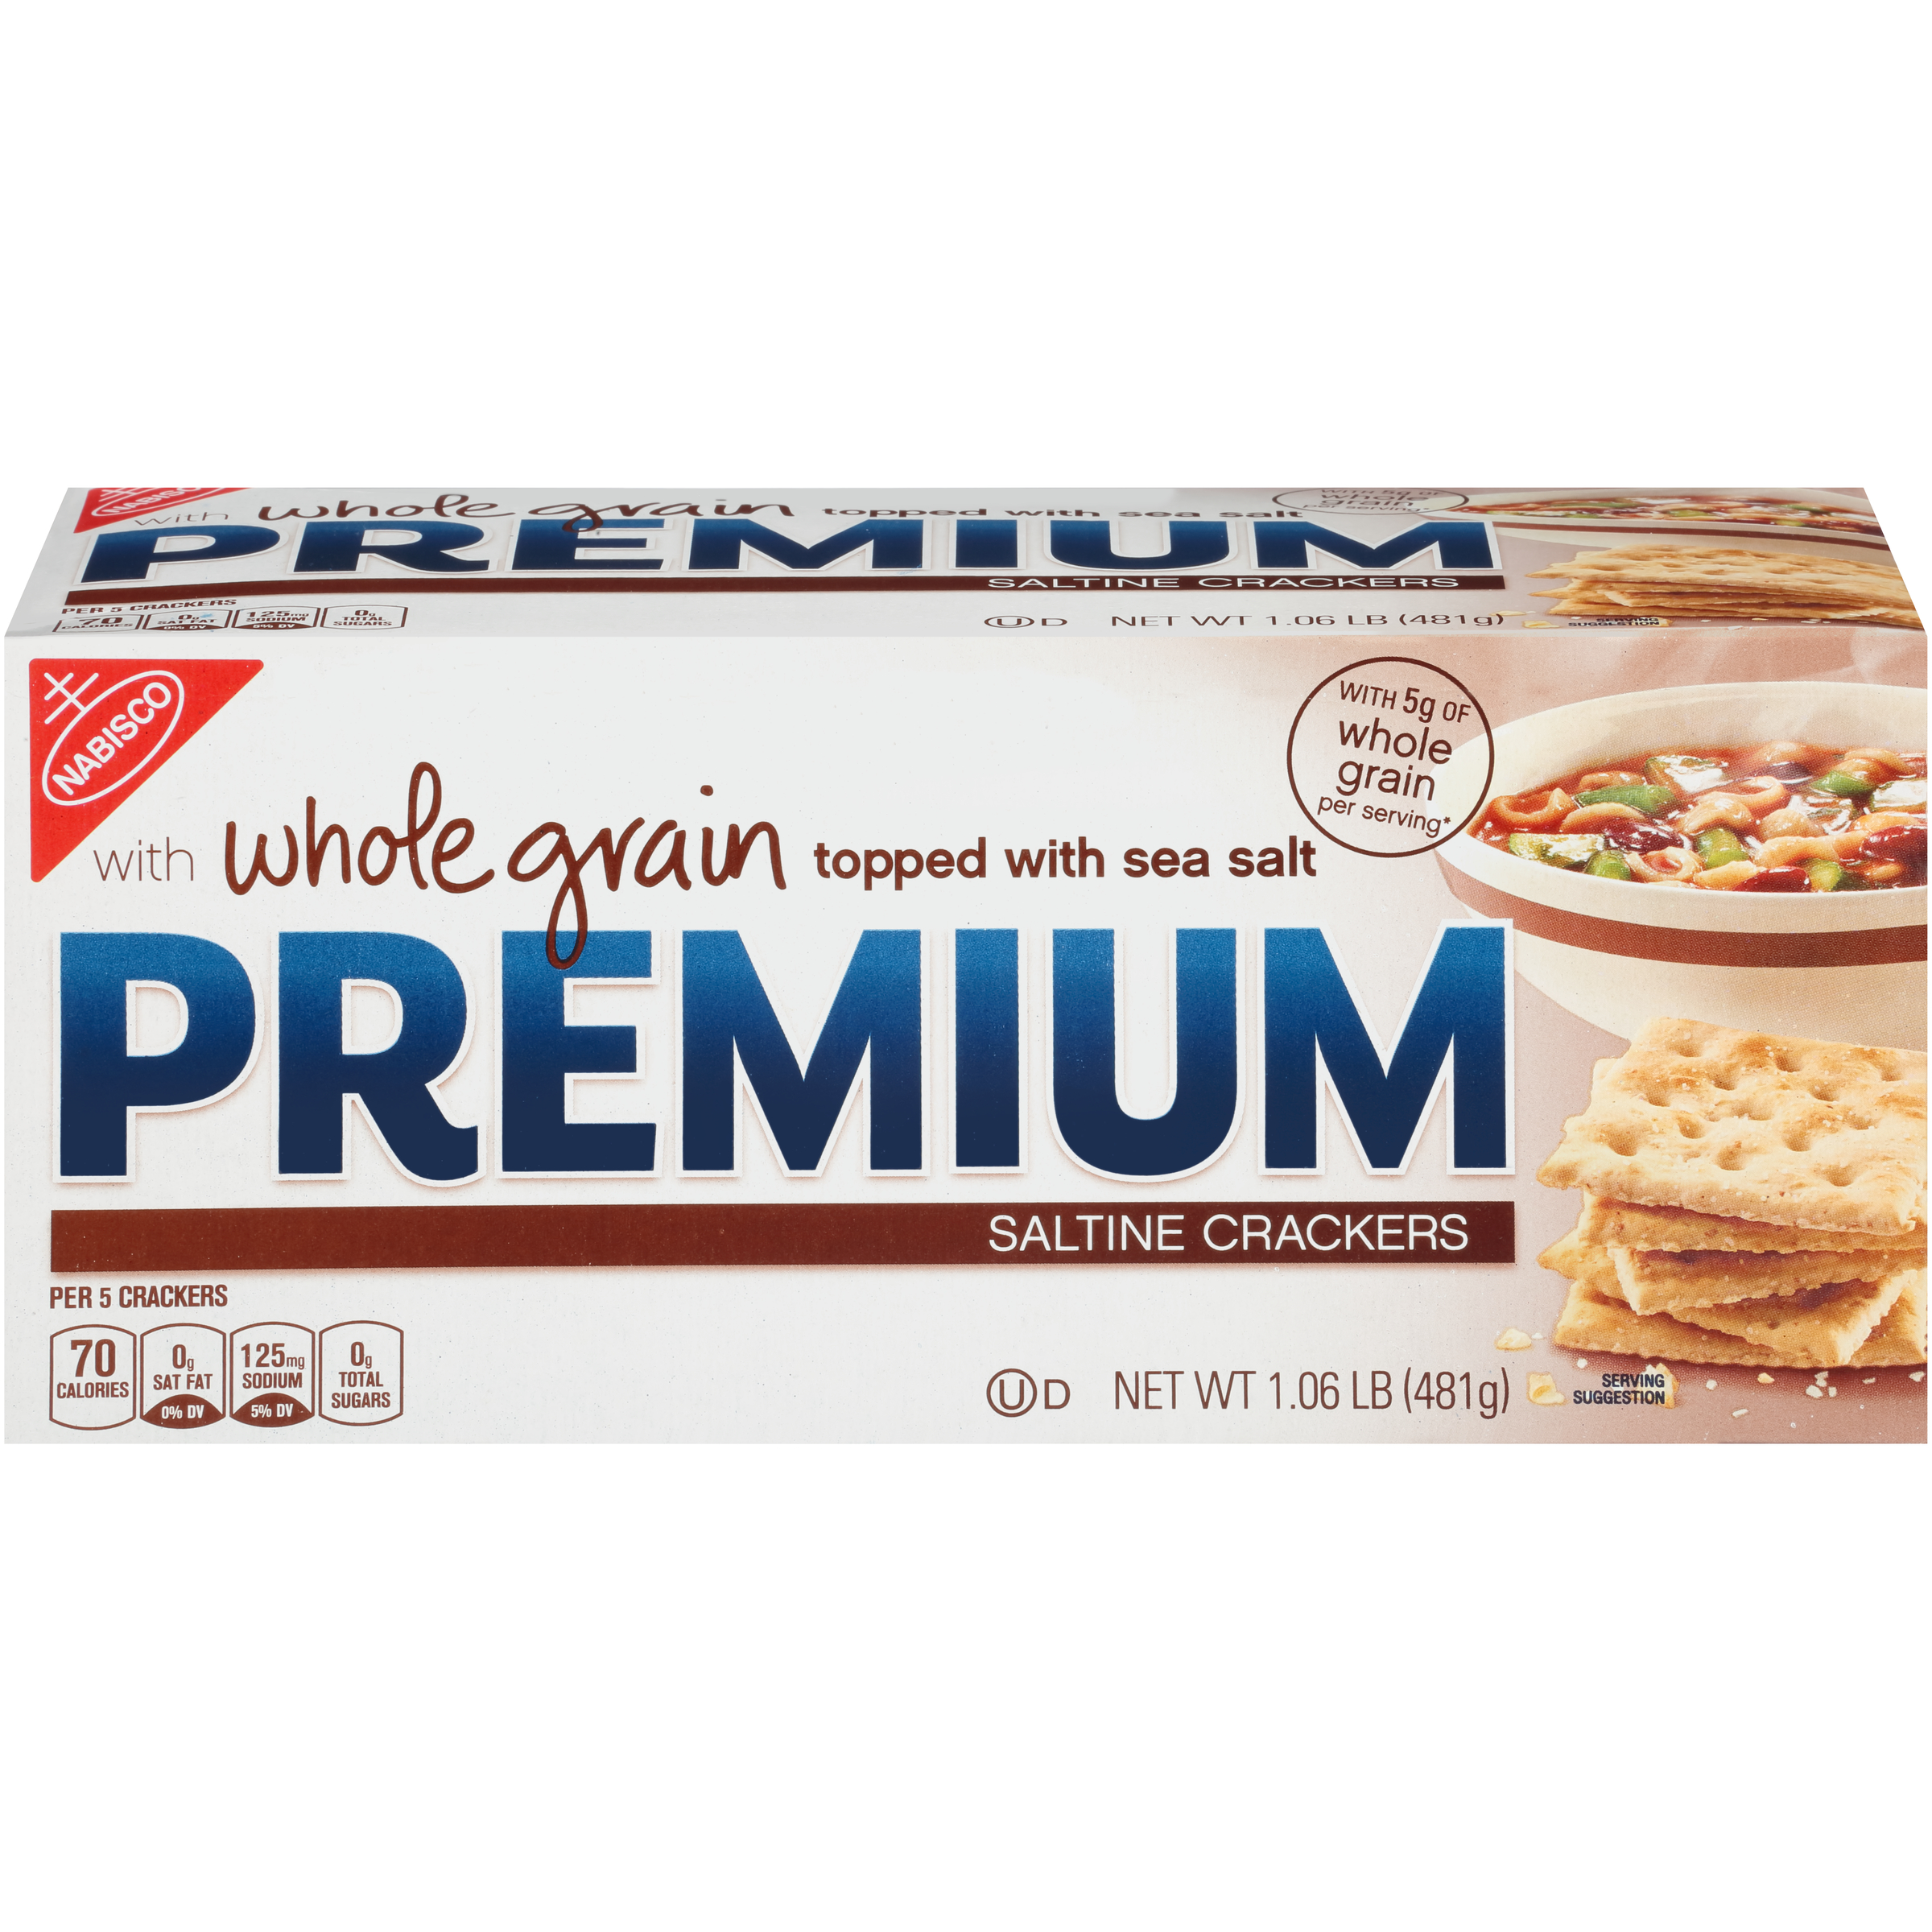 PREMIUM Whole Grain Crackers 1.06 lb